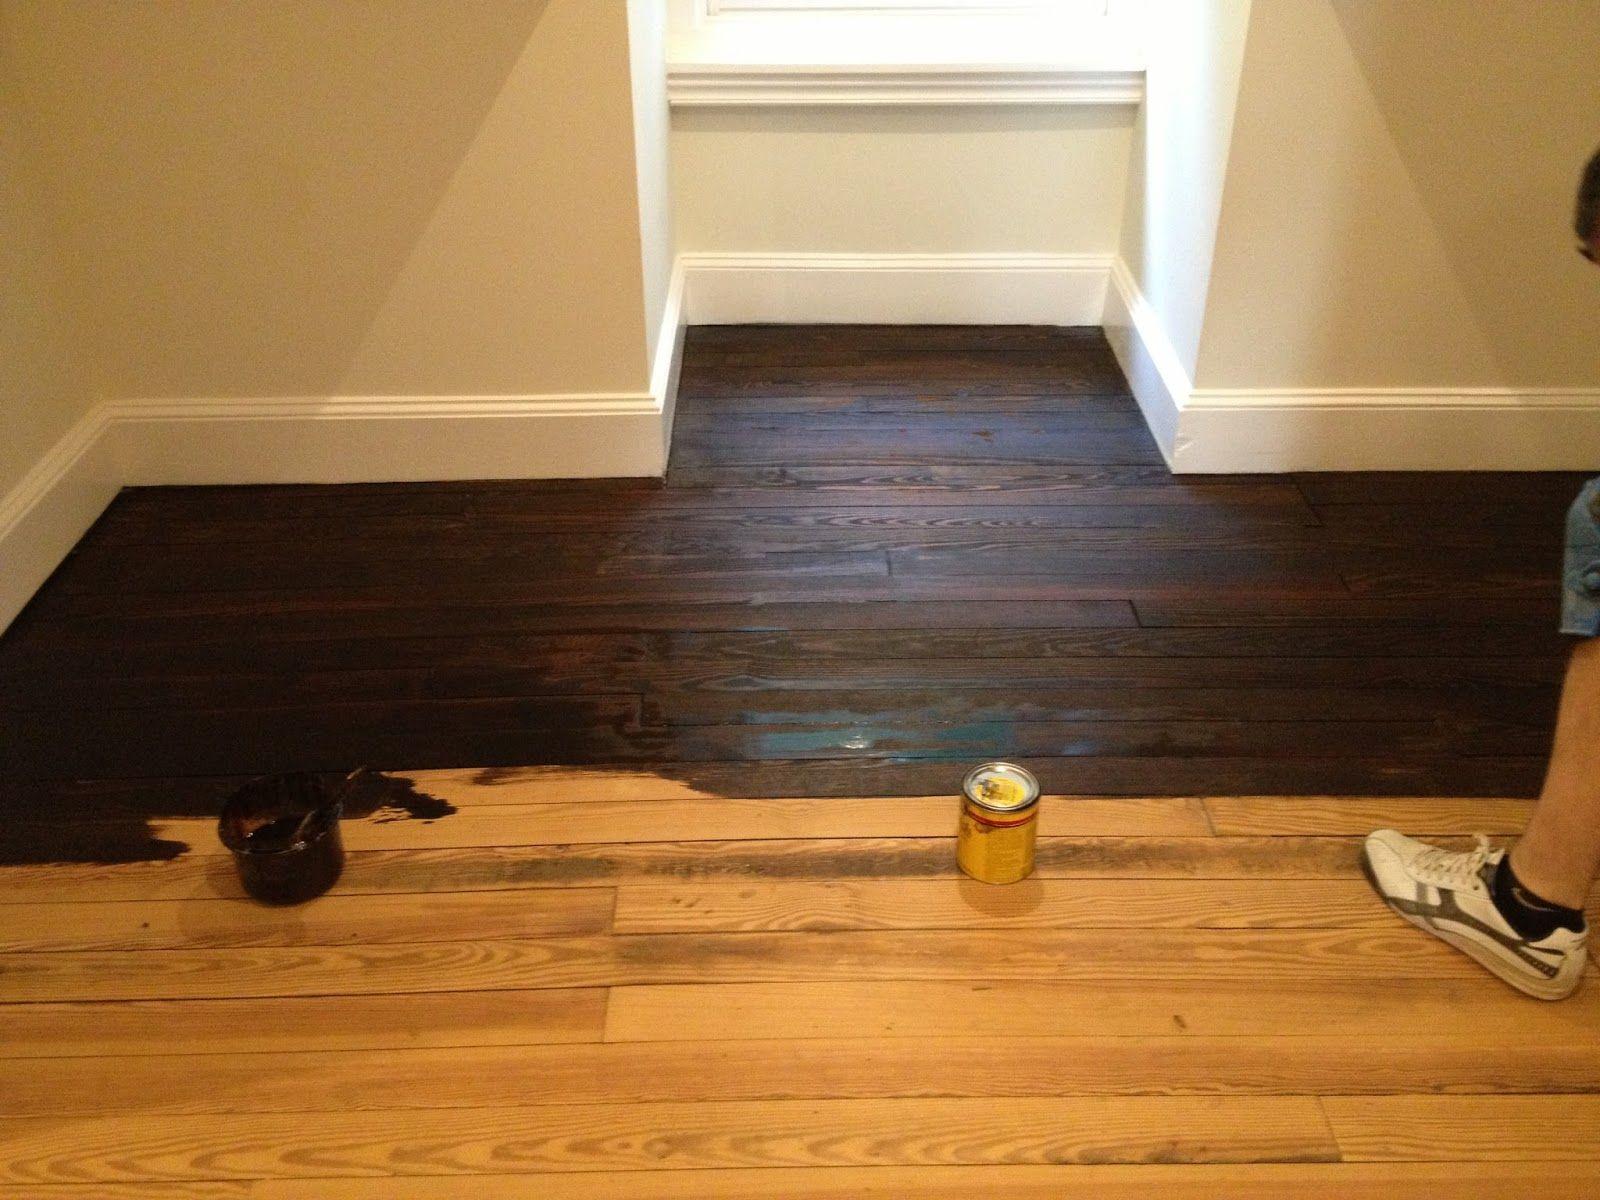 41 Famous Wood Floors Diy Ideas Diy Hardwood Floors Diy Wood